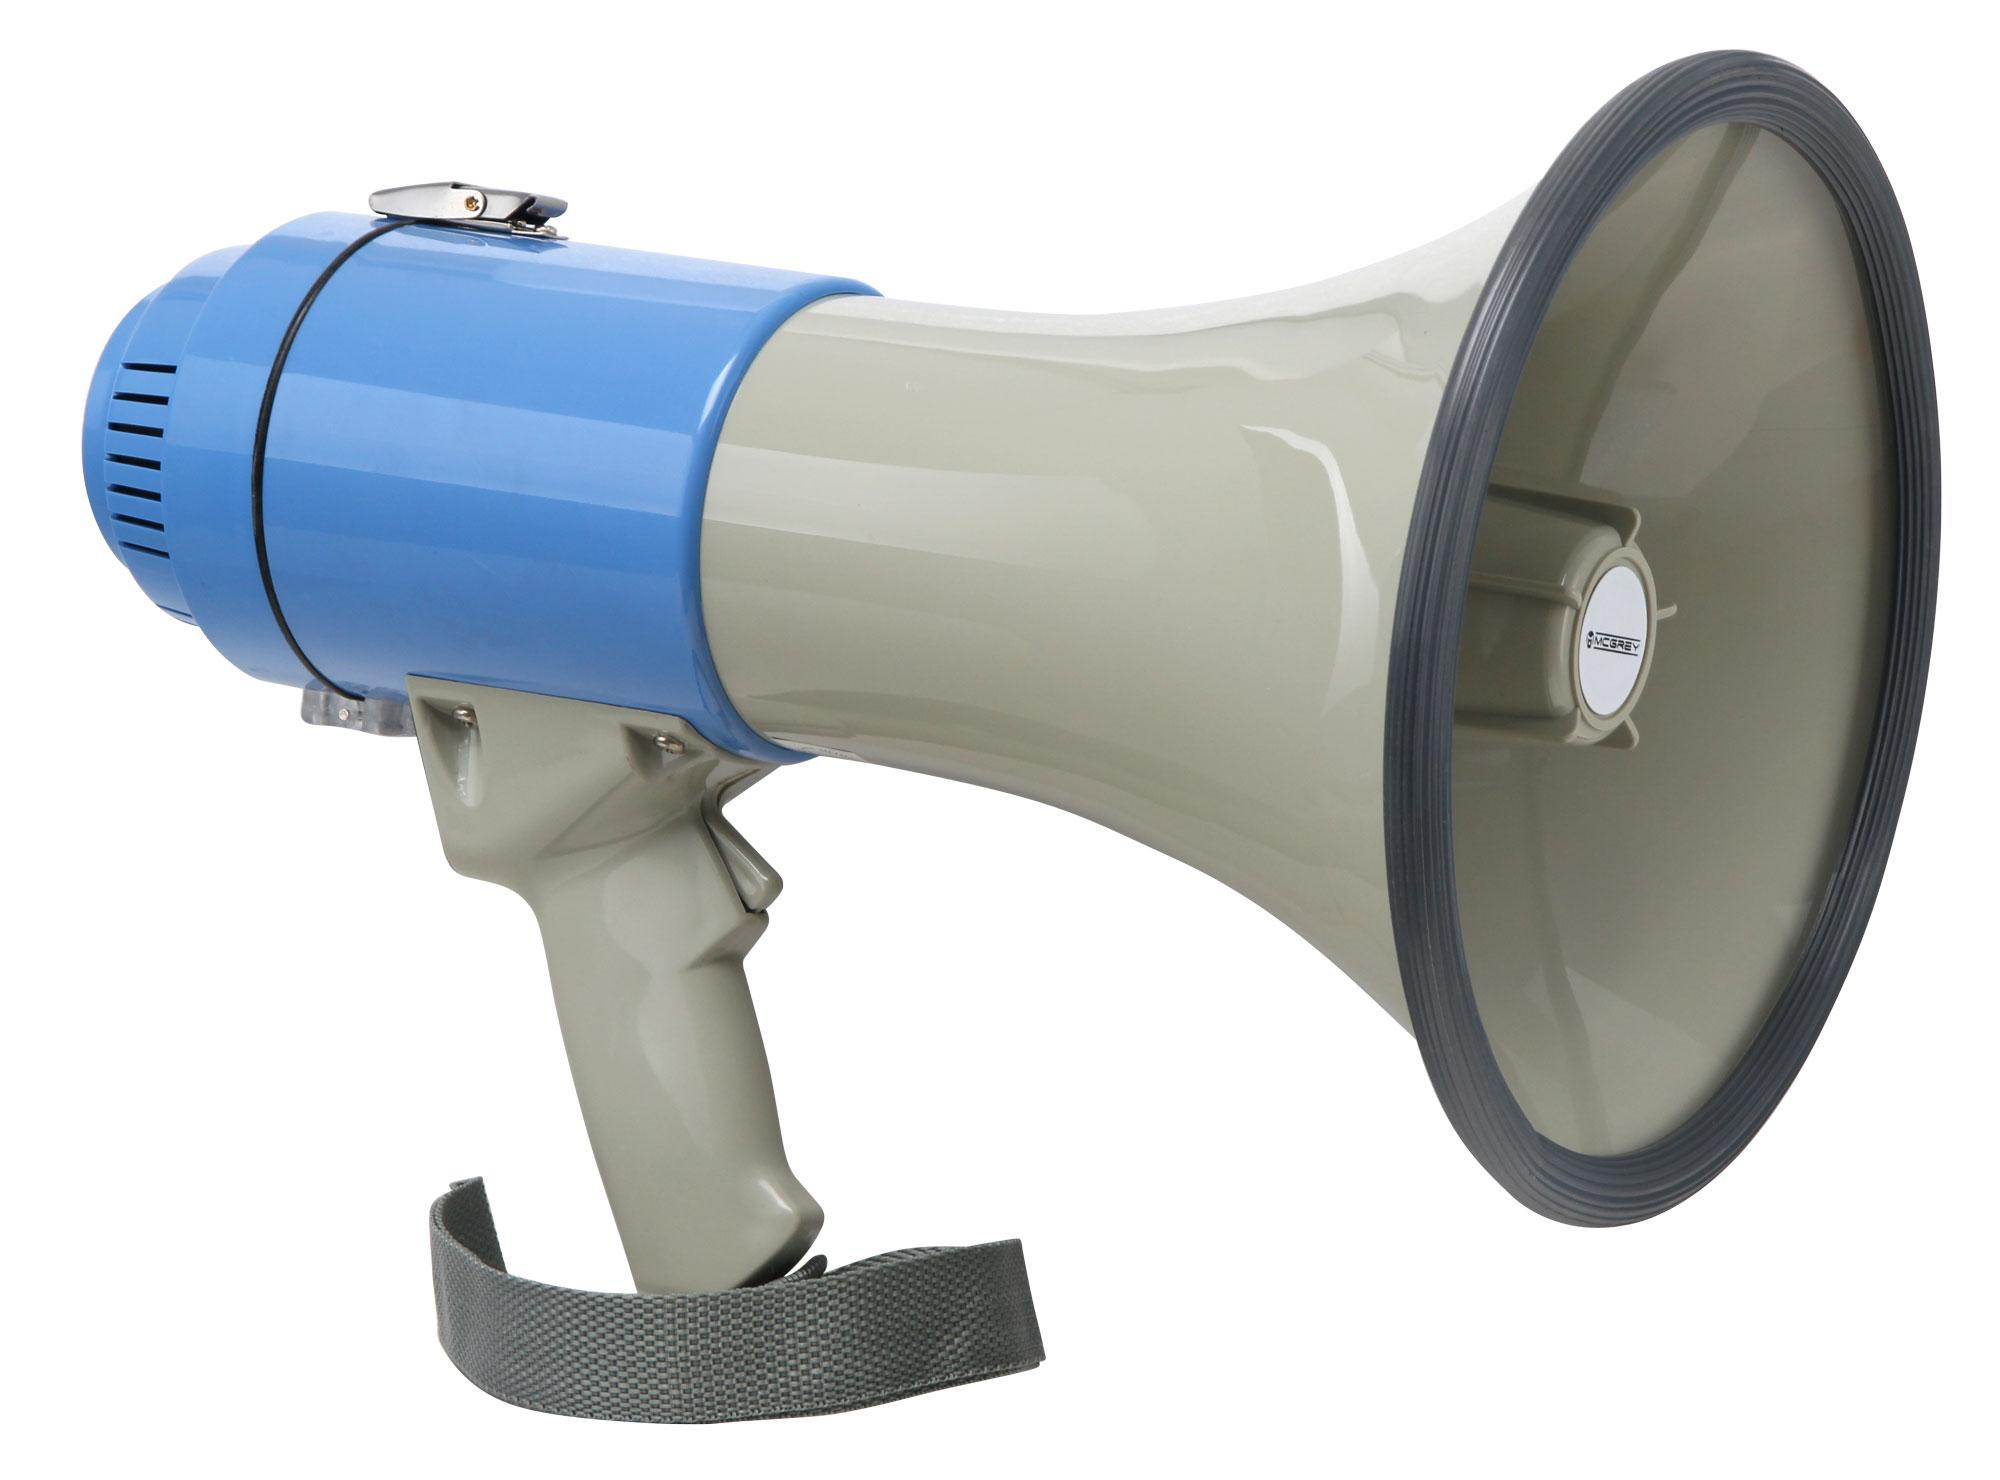 McGrey MP 200S Megaphon, max. 60 Watt, 1000m Retoure (Zustand sehr gut)